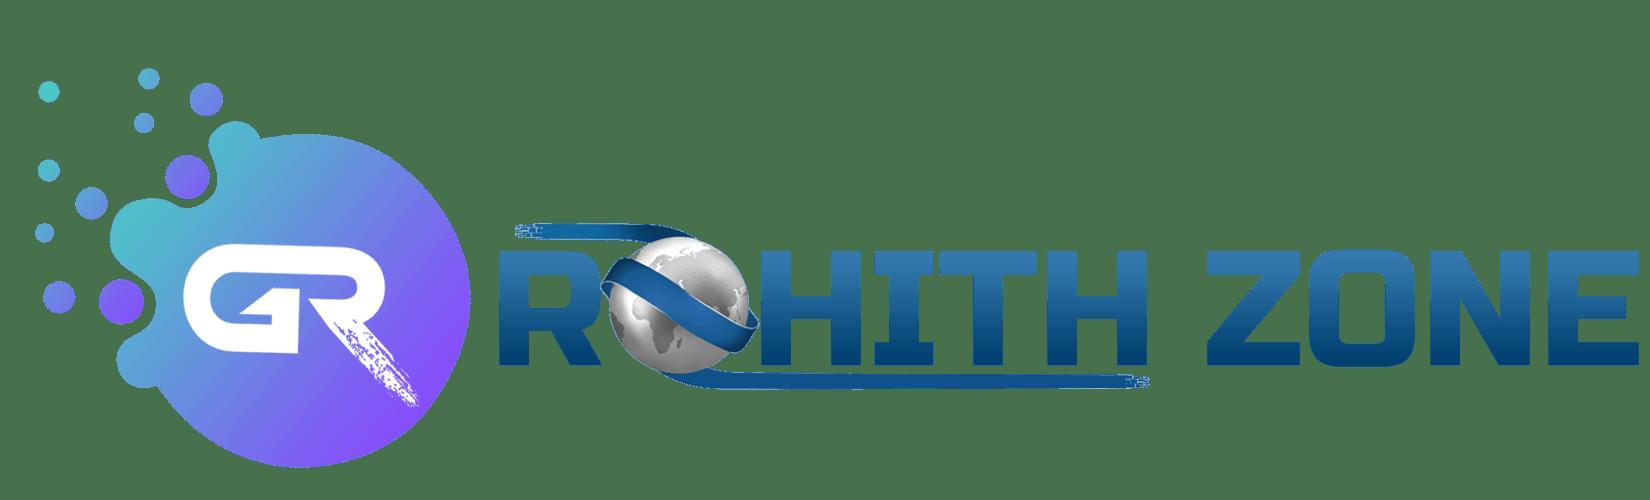 Rohith Zone